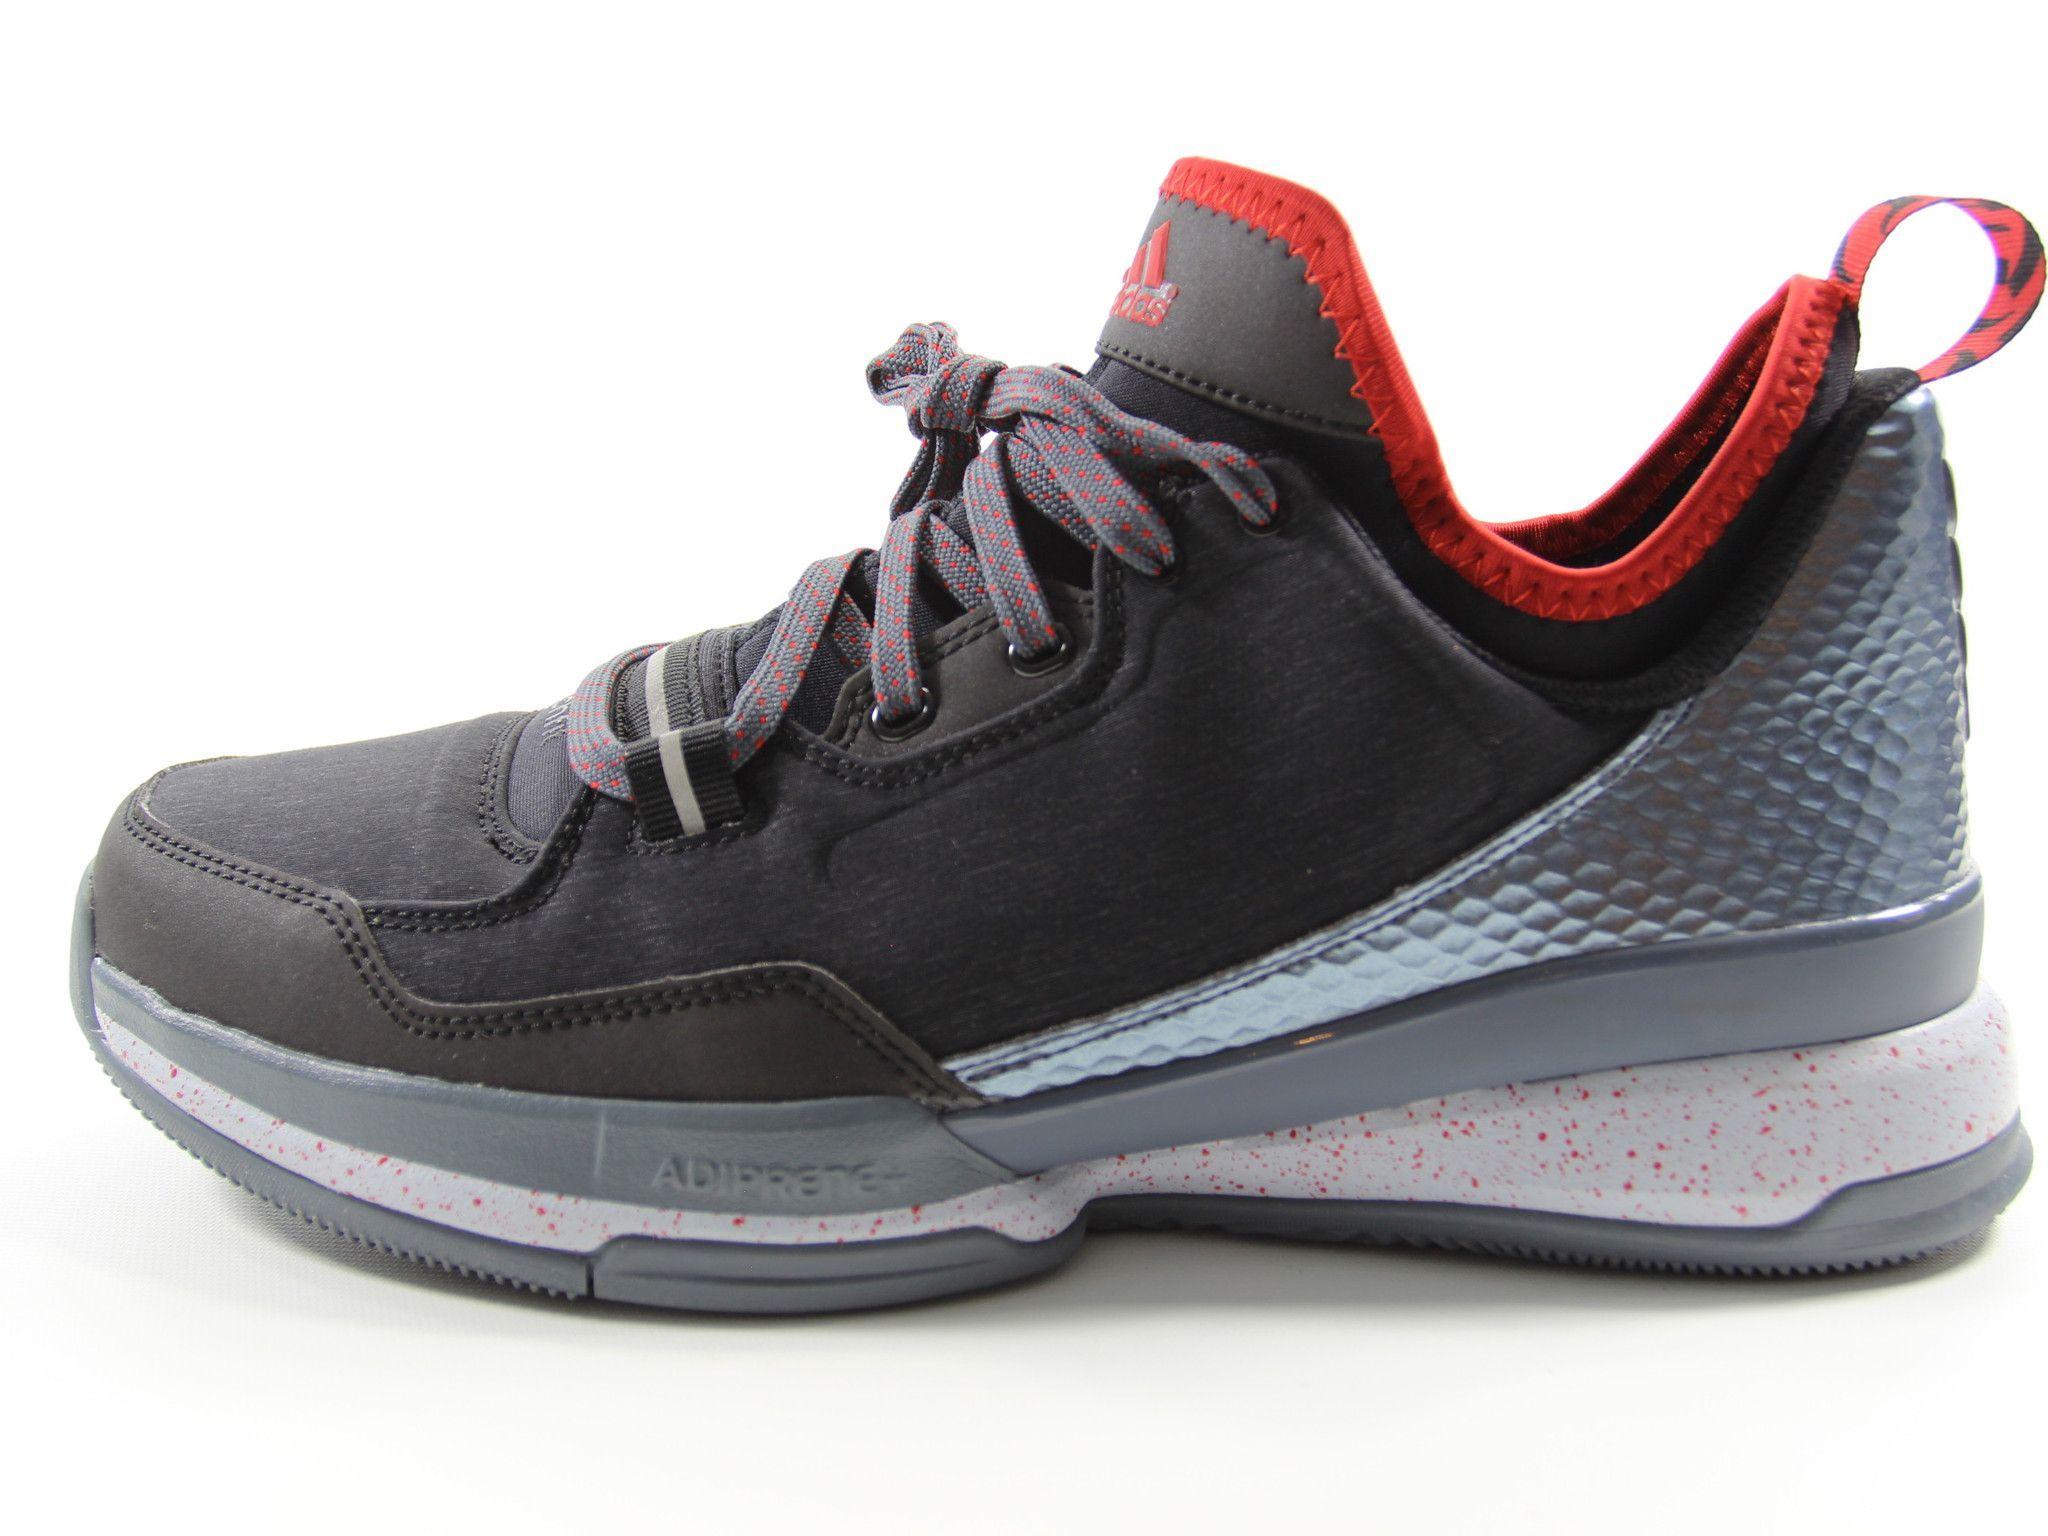 Adidas D Lillard 1 Damian Tech Fit Basketball Shoes Size 11.5 (Black/Red/ Silver)